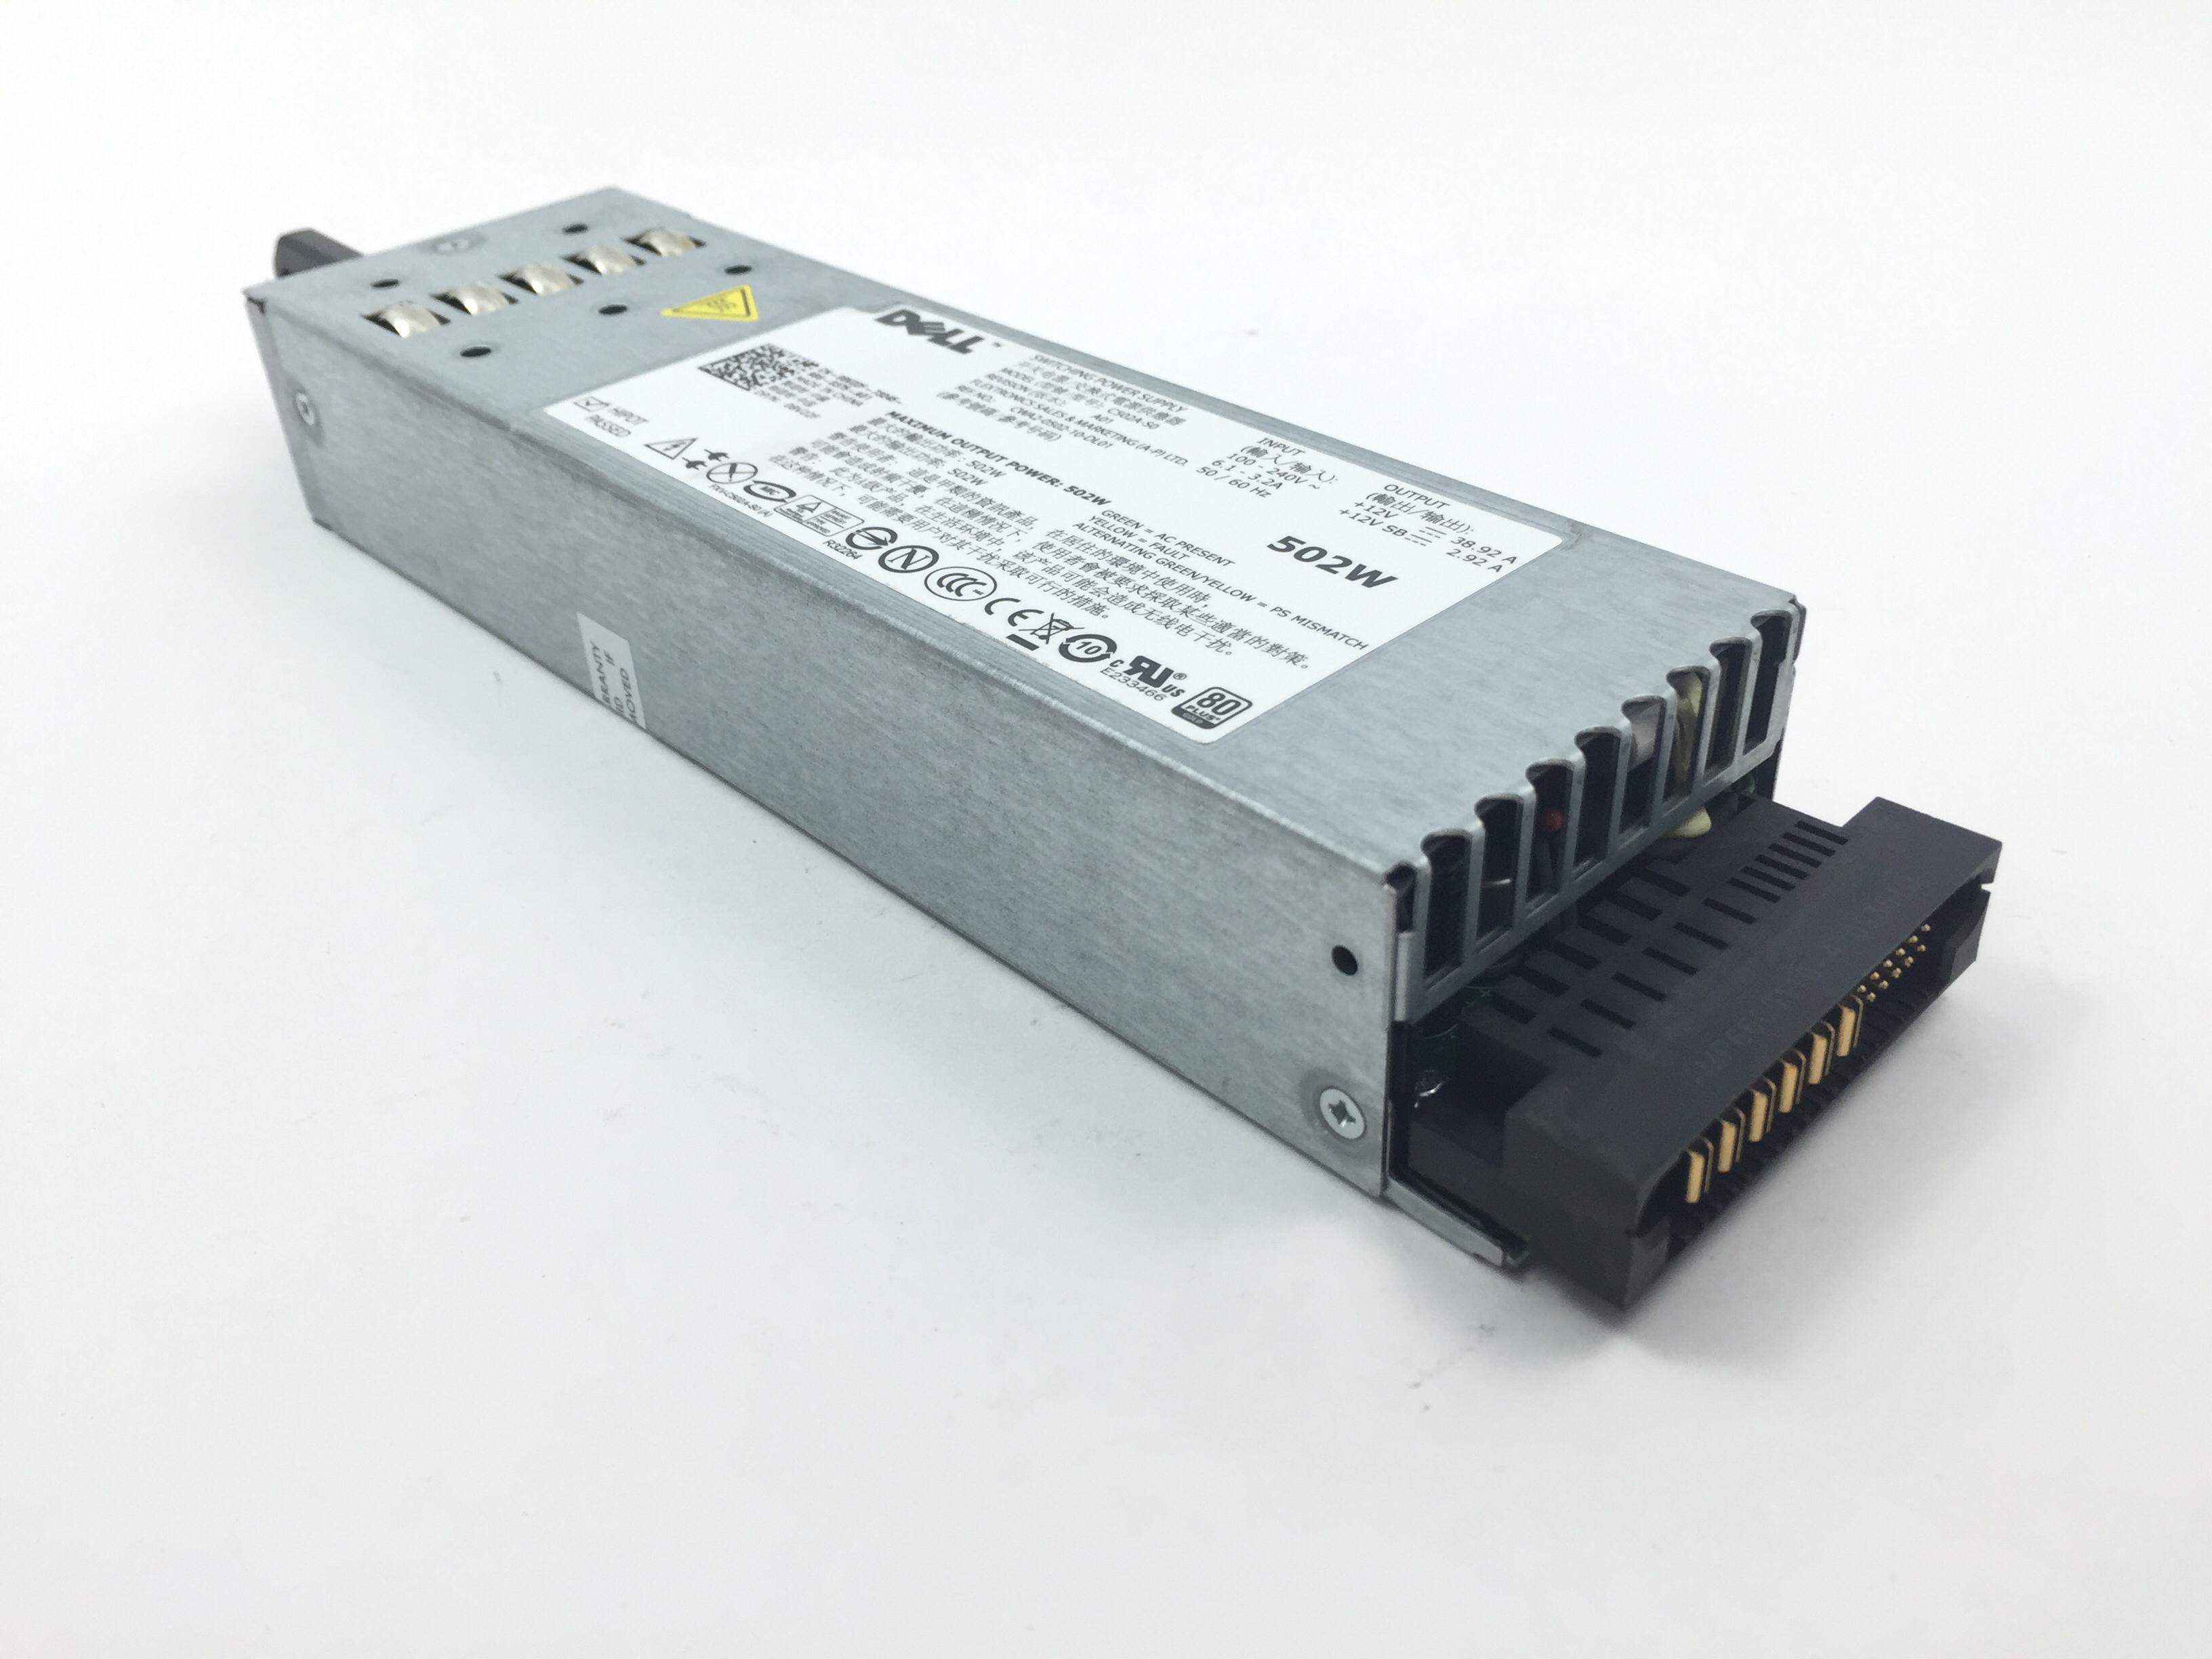 DELL POWEREDGE R610 502W POWER SUPPLY (8V22F)